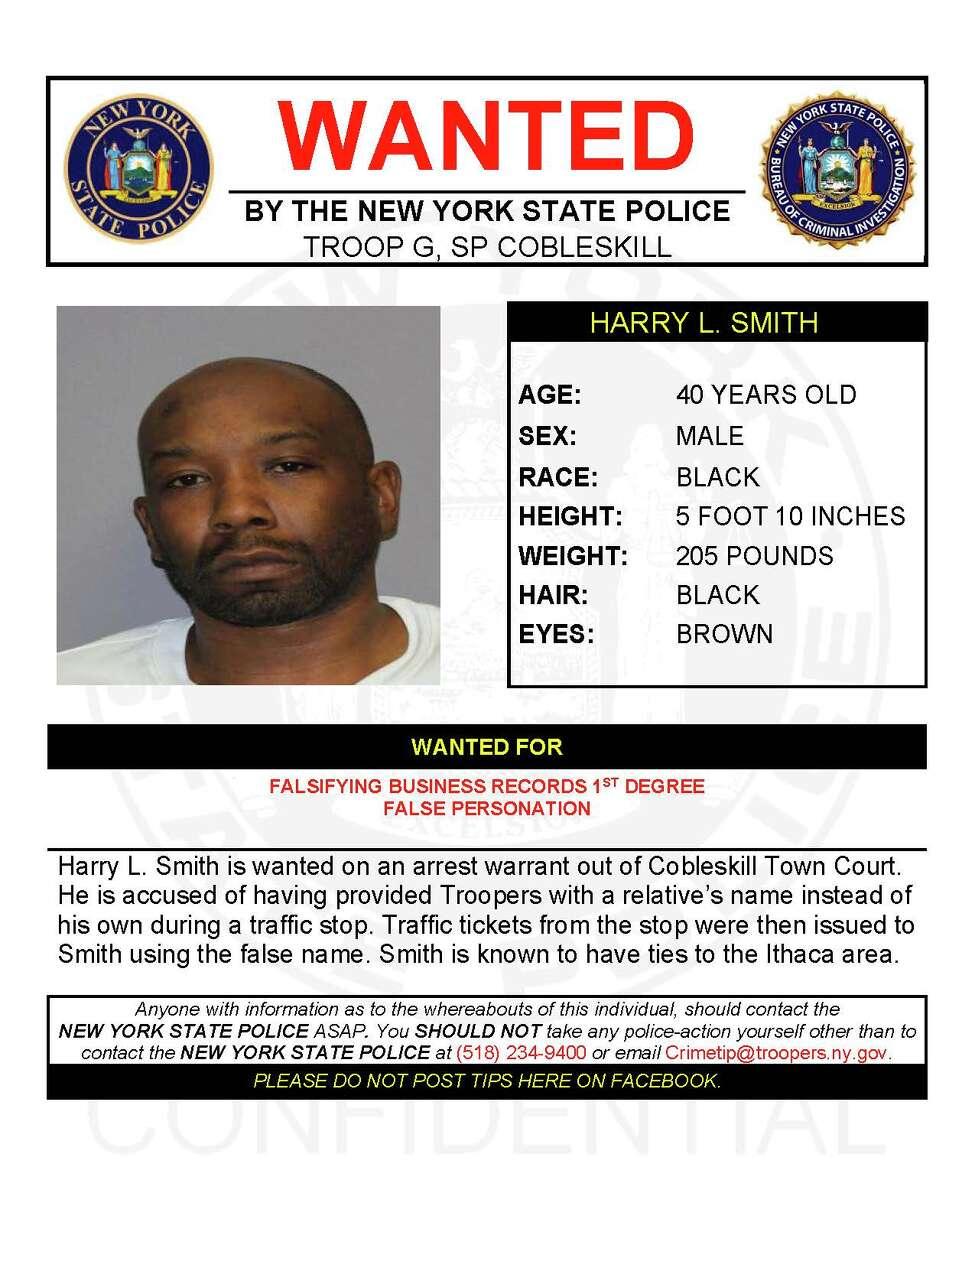 Harry L. Smith (NY State Police)